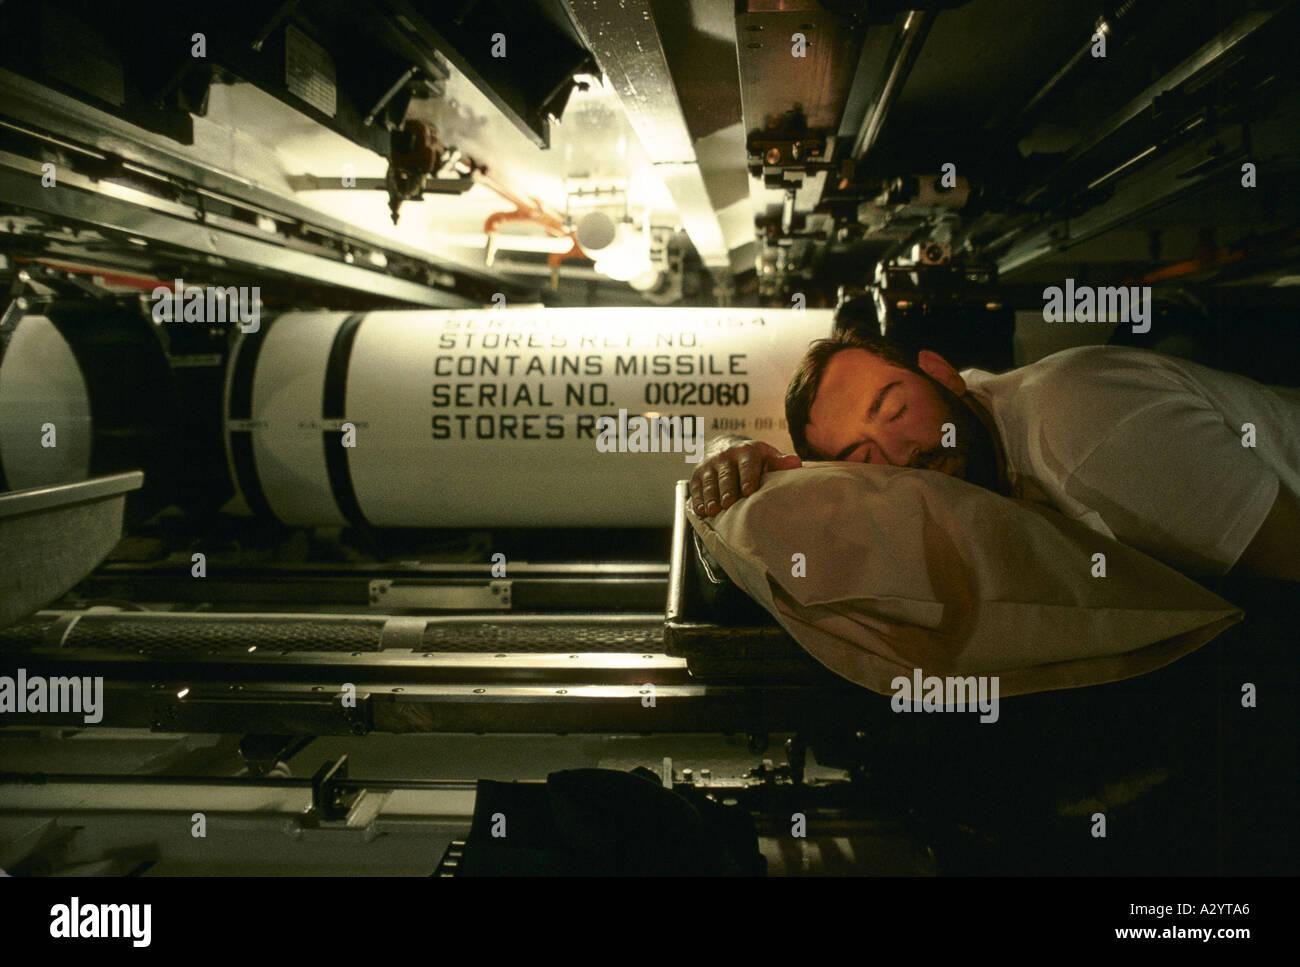 crew sleeping in the torpedo tube of a submarine Stock Photo - Alamy